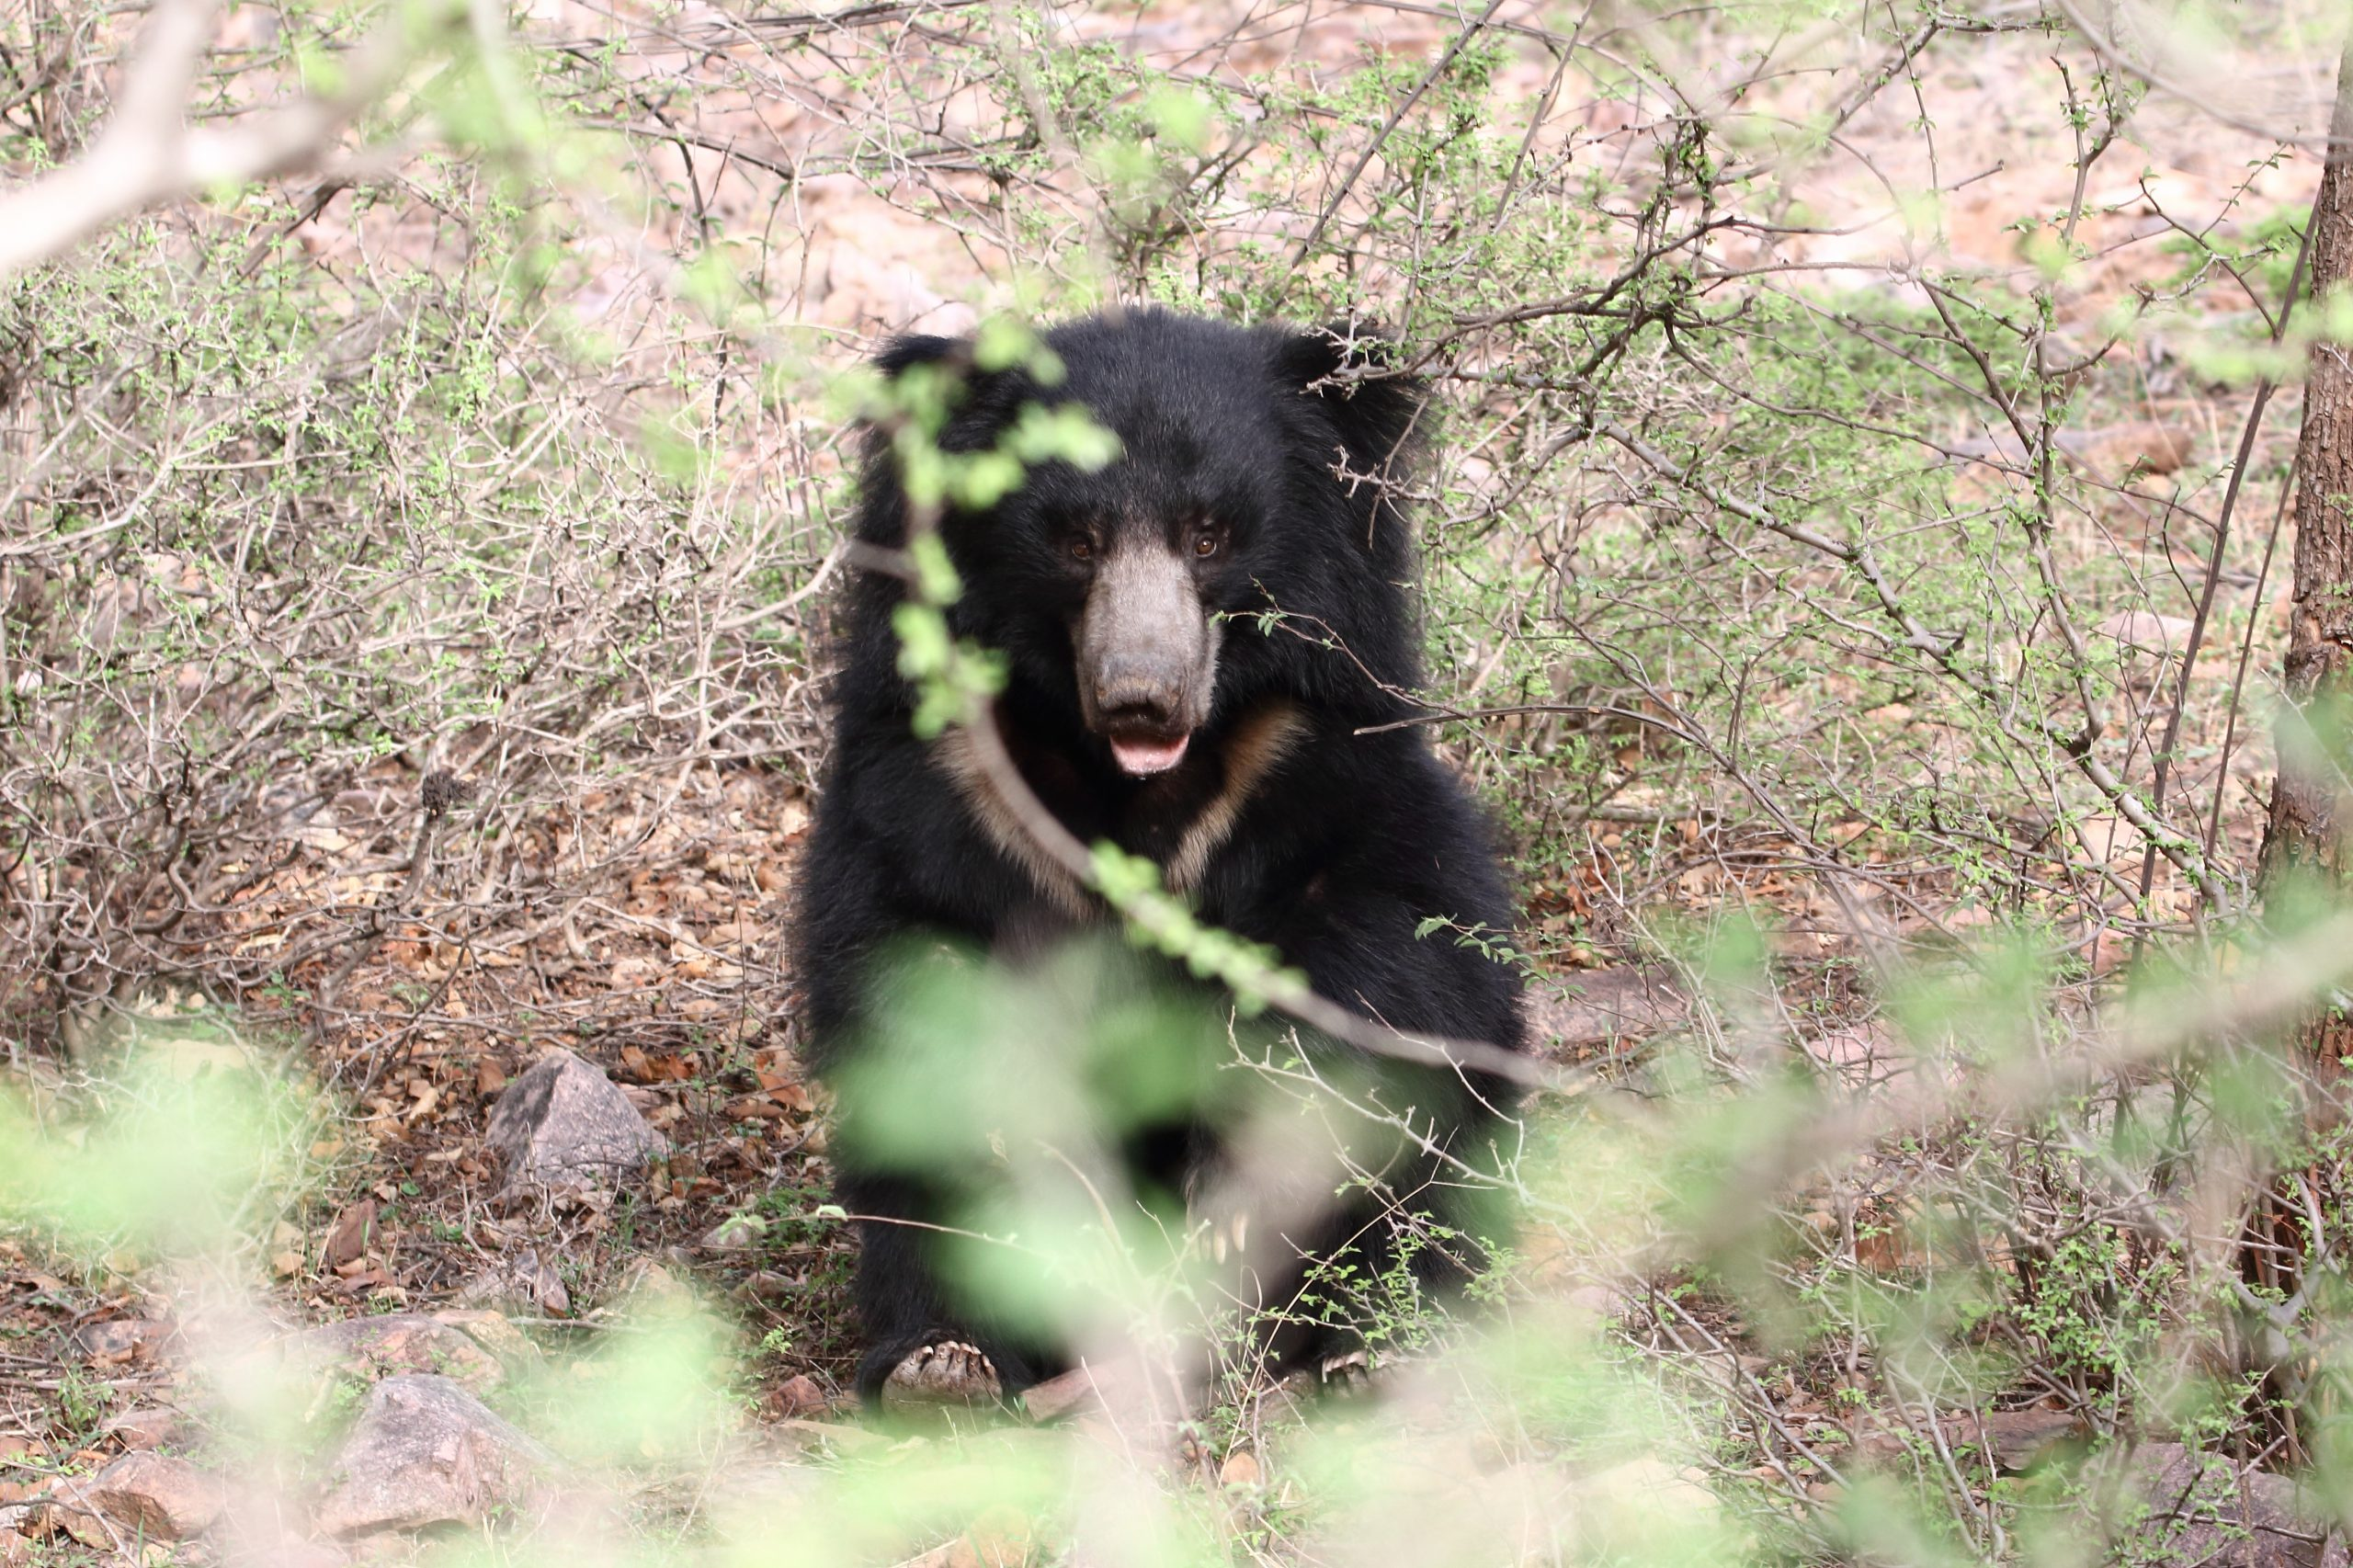 Sloth bear in bush